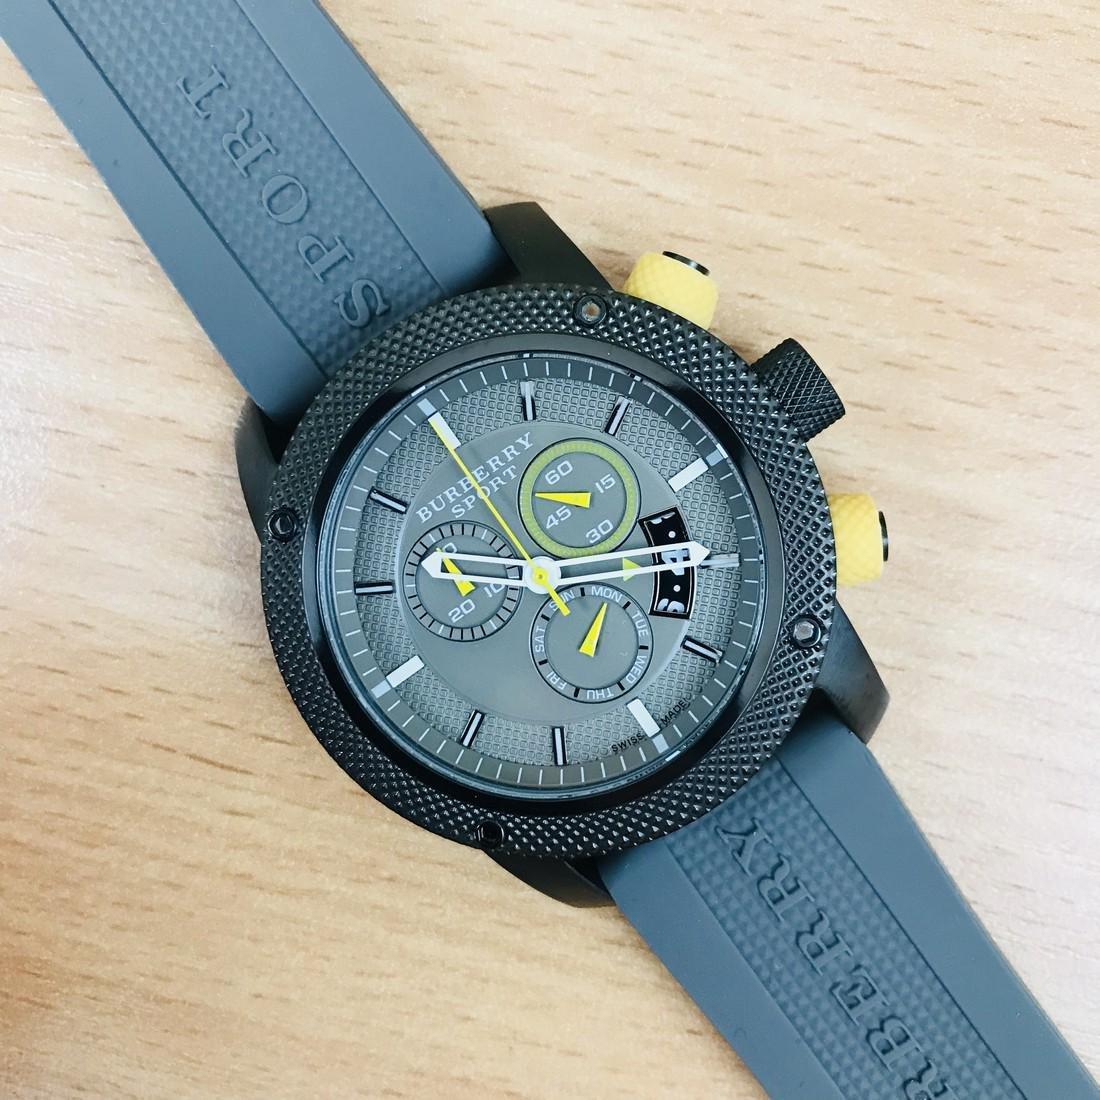 Burberry Endurance Swiss Made Men's Chronograph Watch